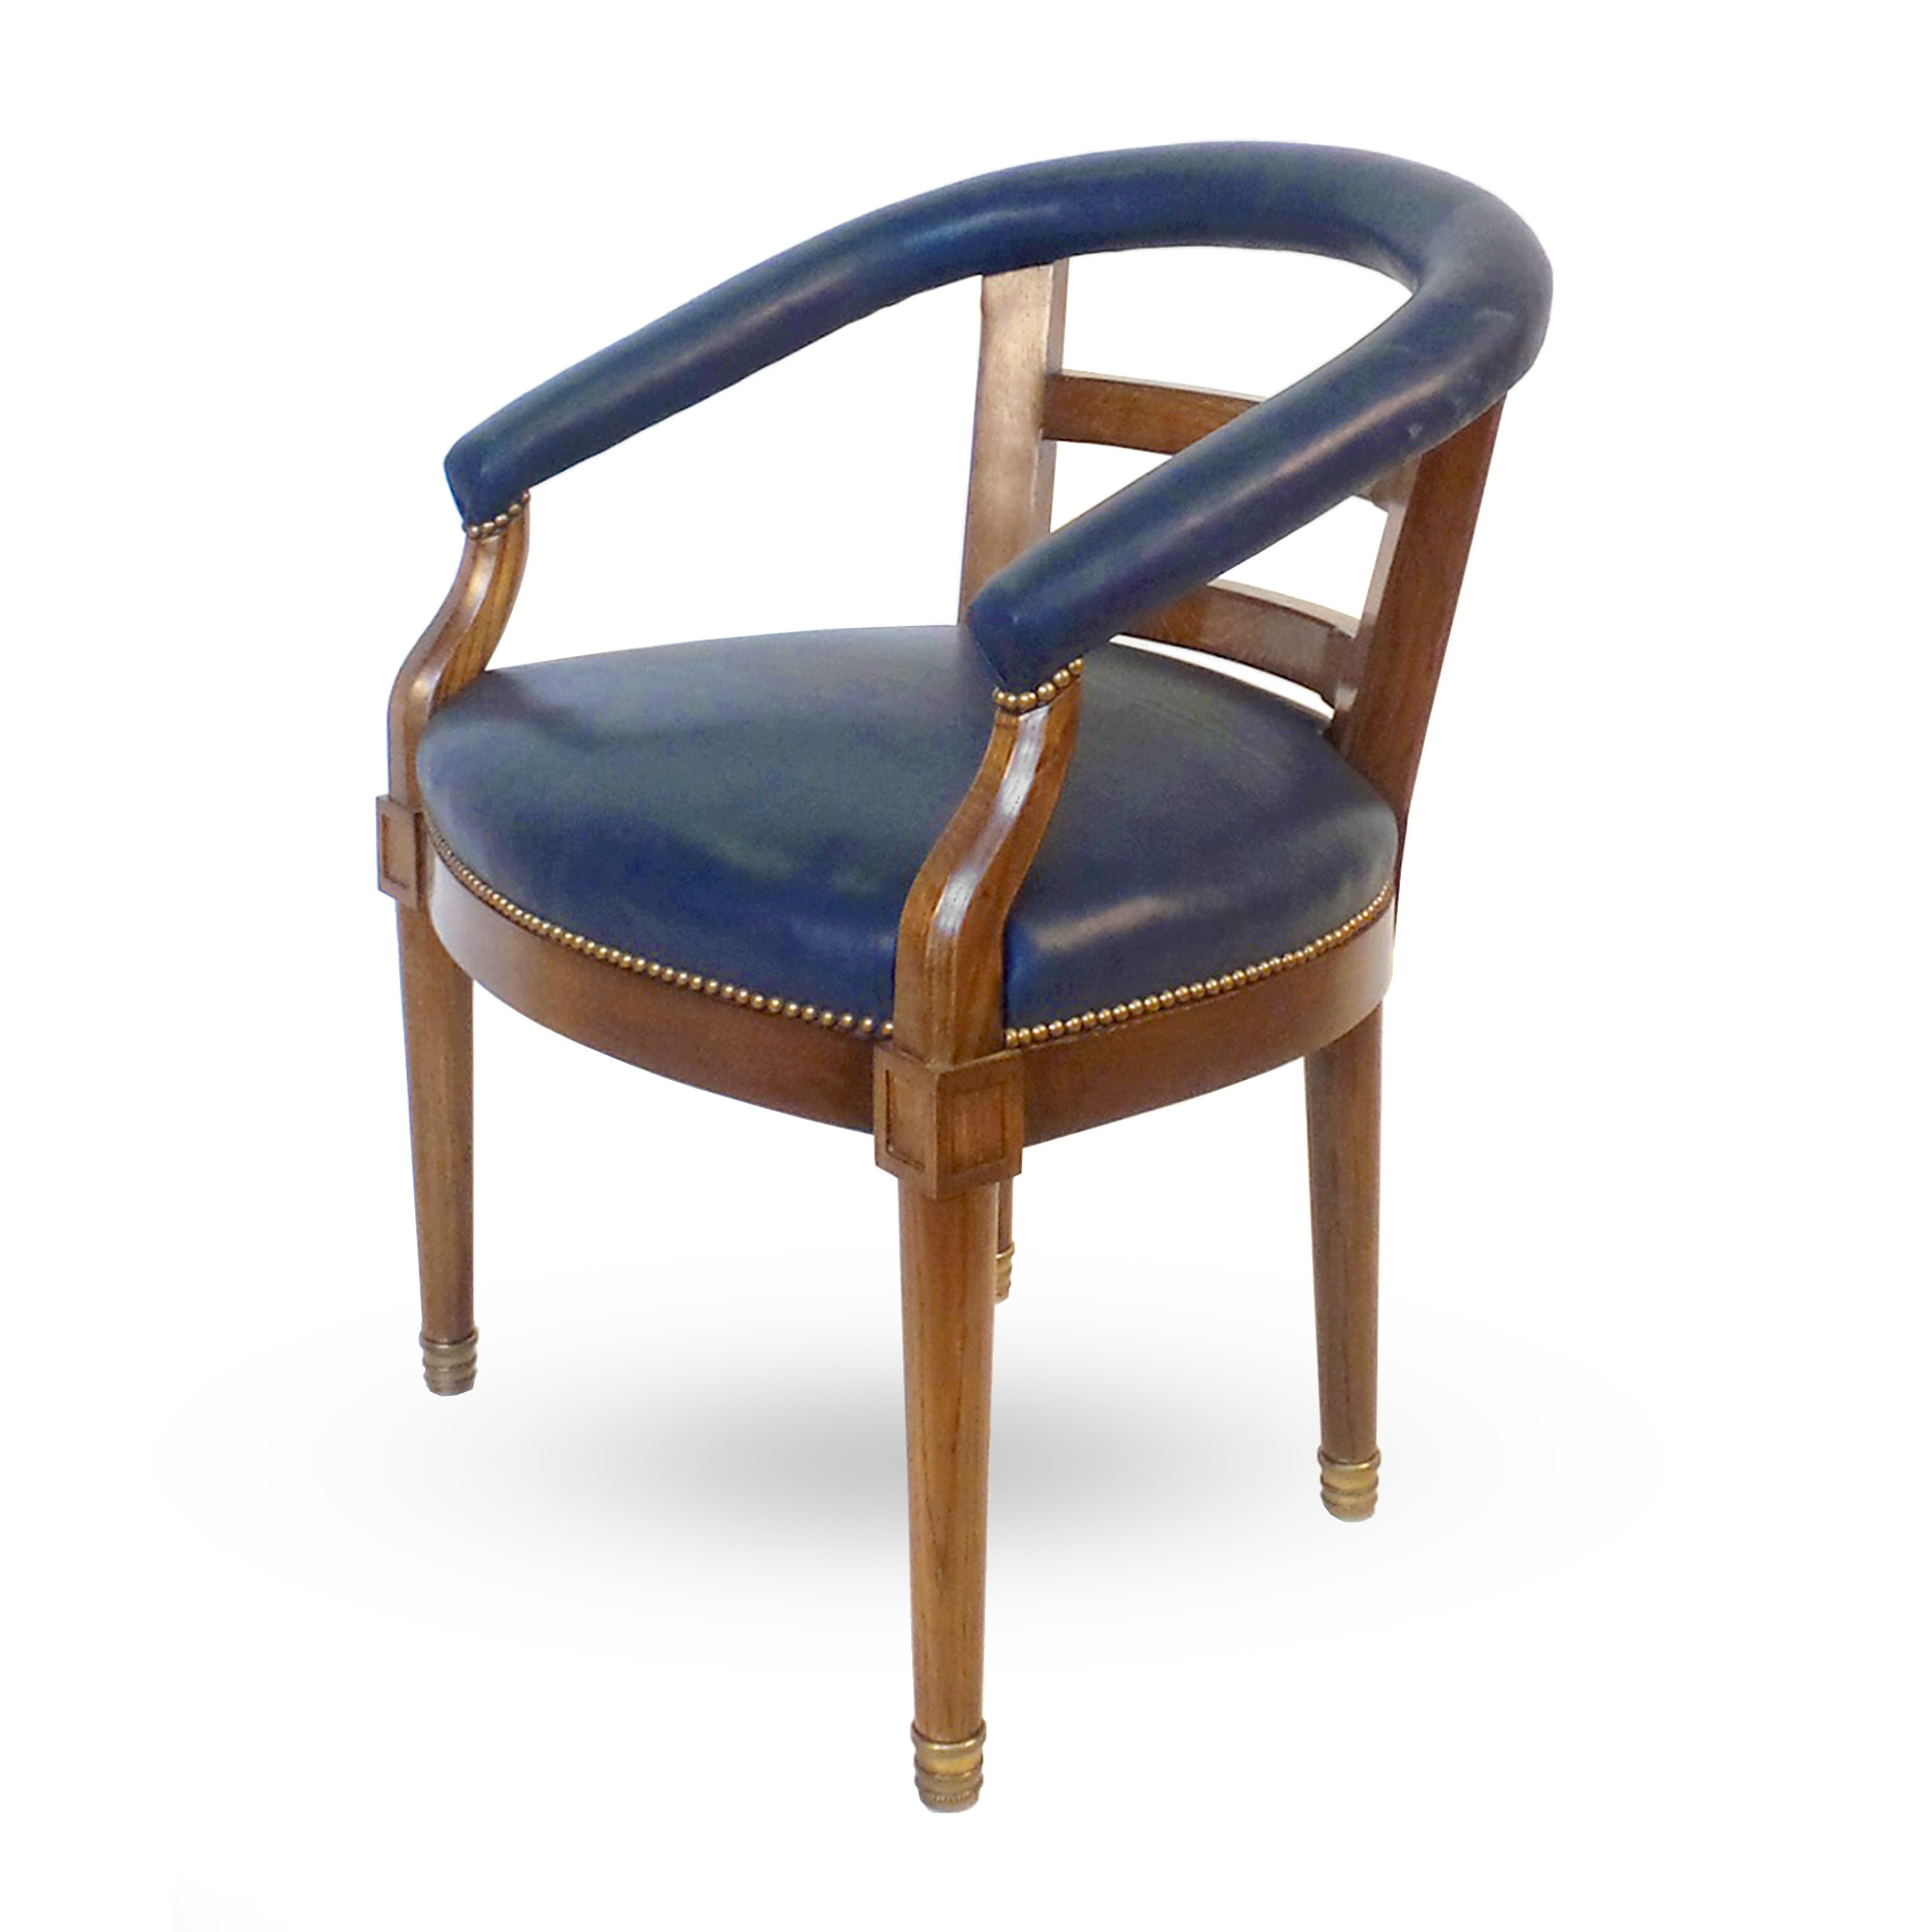 barrel back chair allsteel acuity american armchair victoria son r814 nail head trim brass